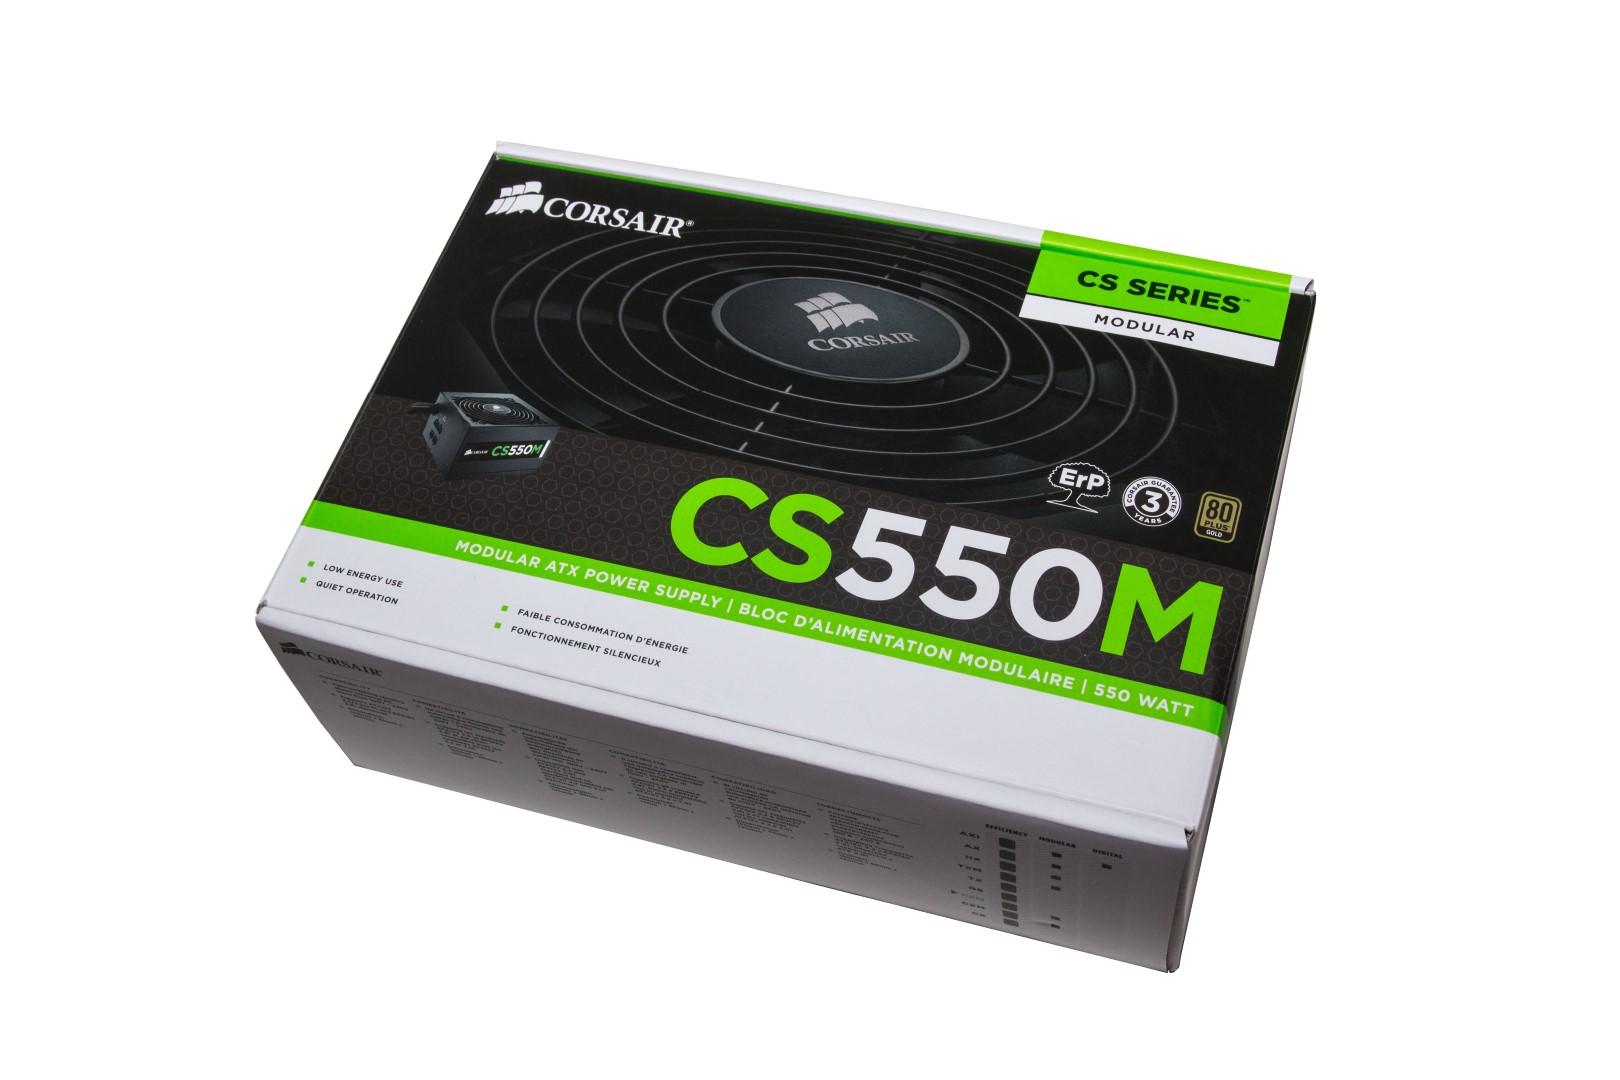 Review] Corsair CS550M - Kleines Netzteil ganz groß?